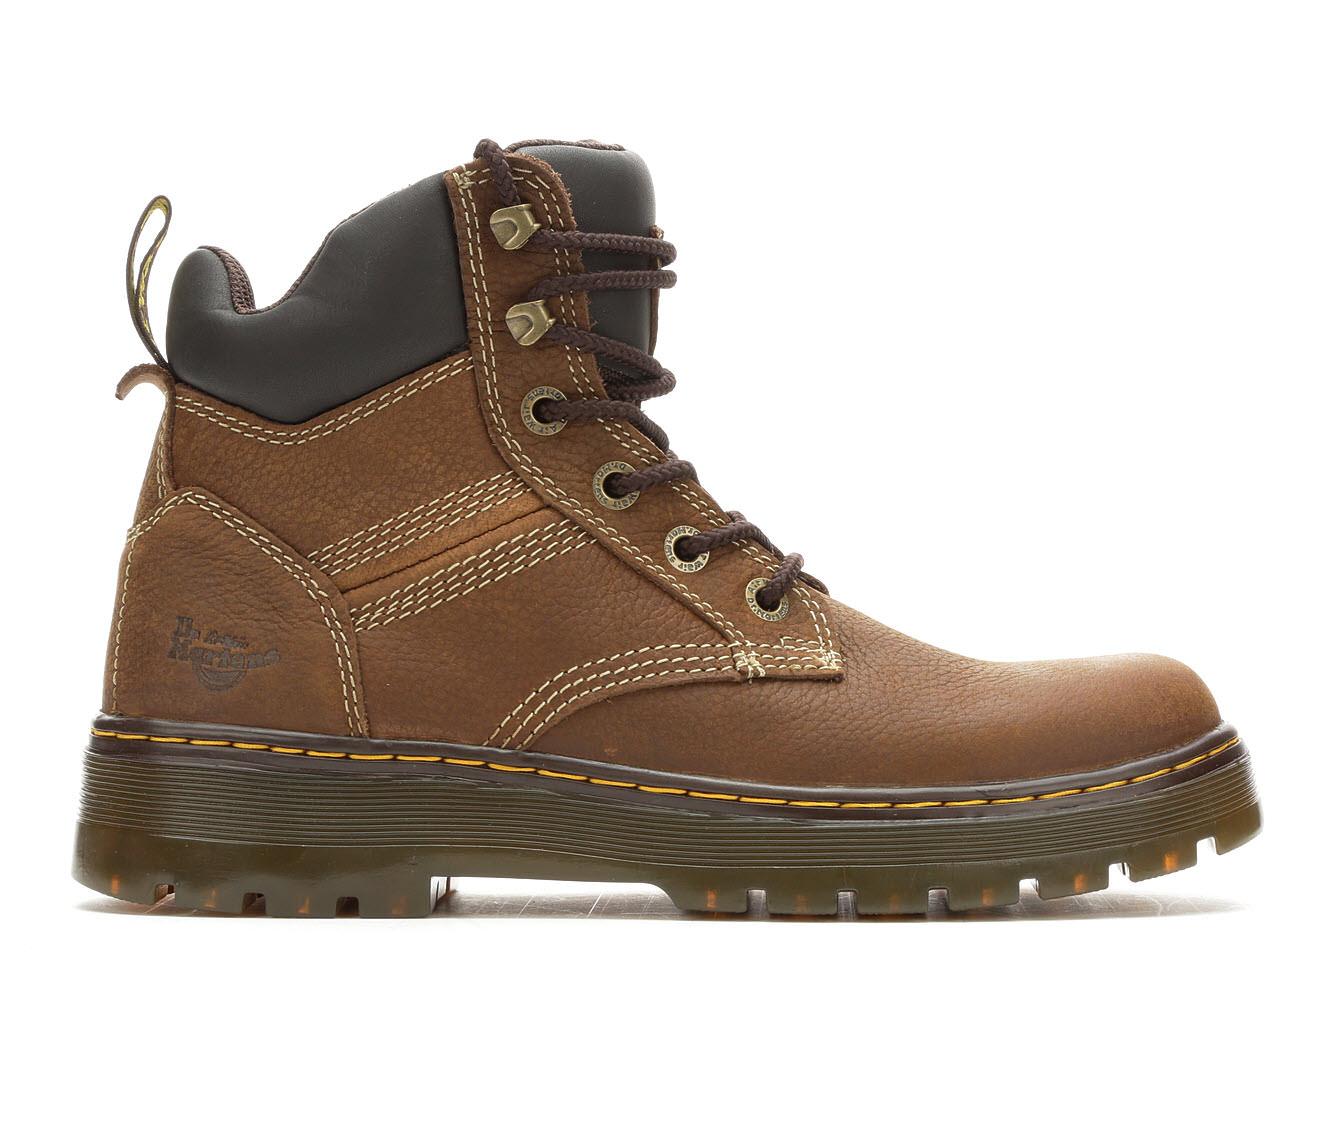 Dr. Martens Industrial Gabion Men's Boots (Brown Leather)